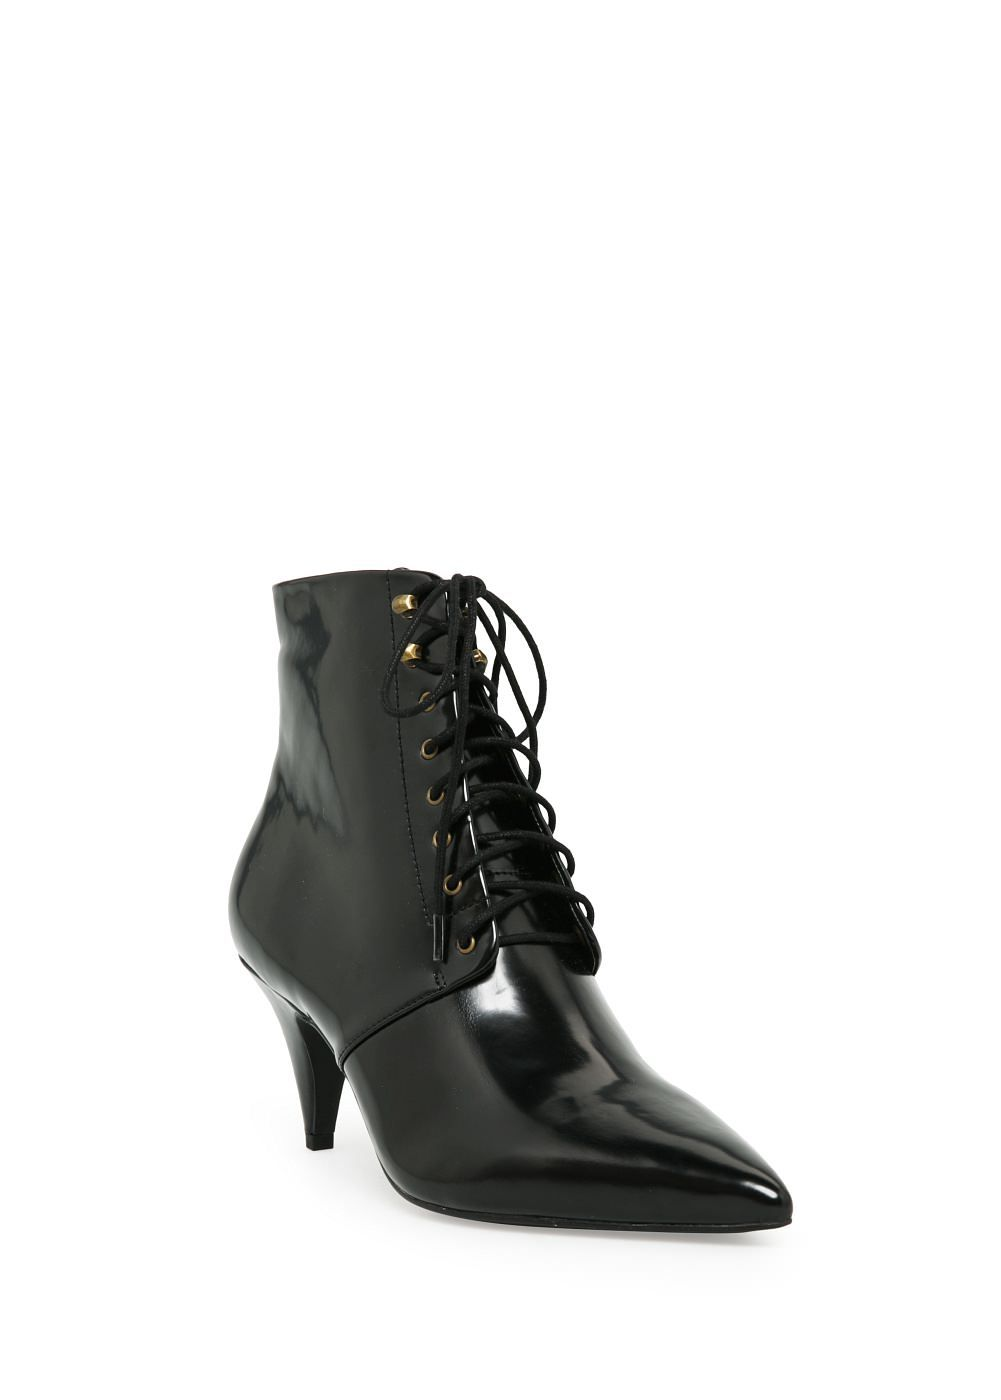 Heel Lace Up Ankle Boots Woman Mango Slovakia Womens Leather Ankle Boots Leather Boots Heels Boots